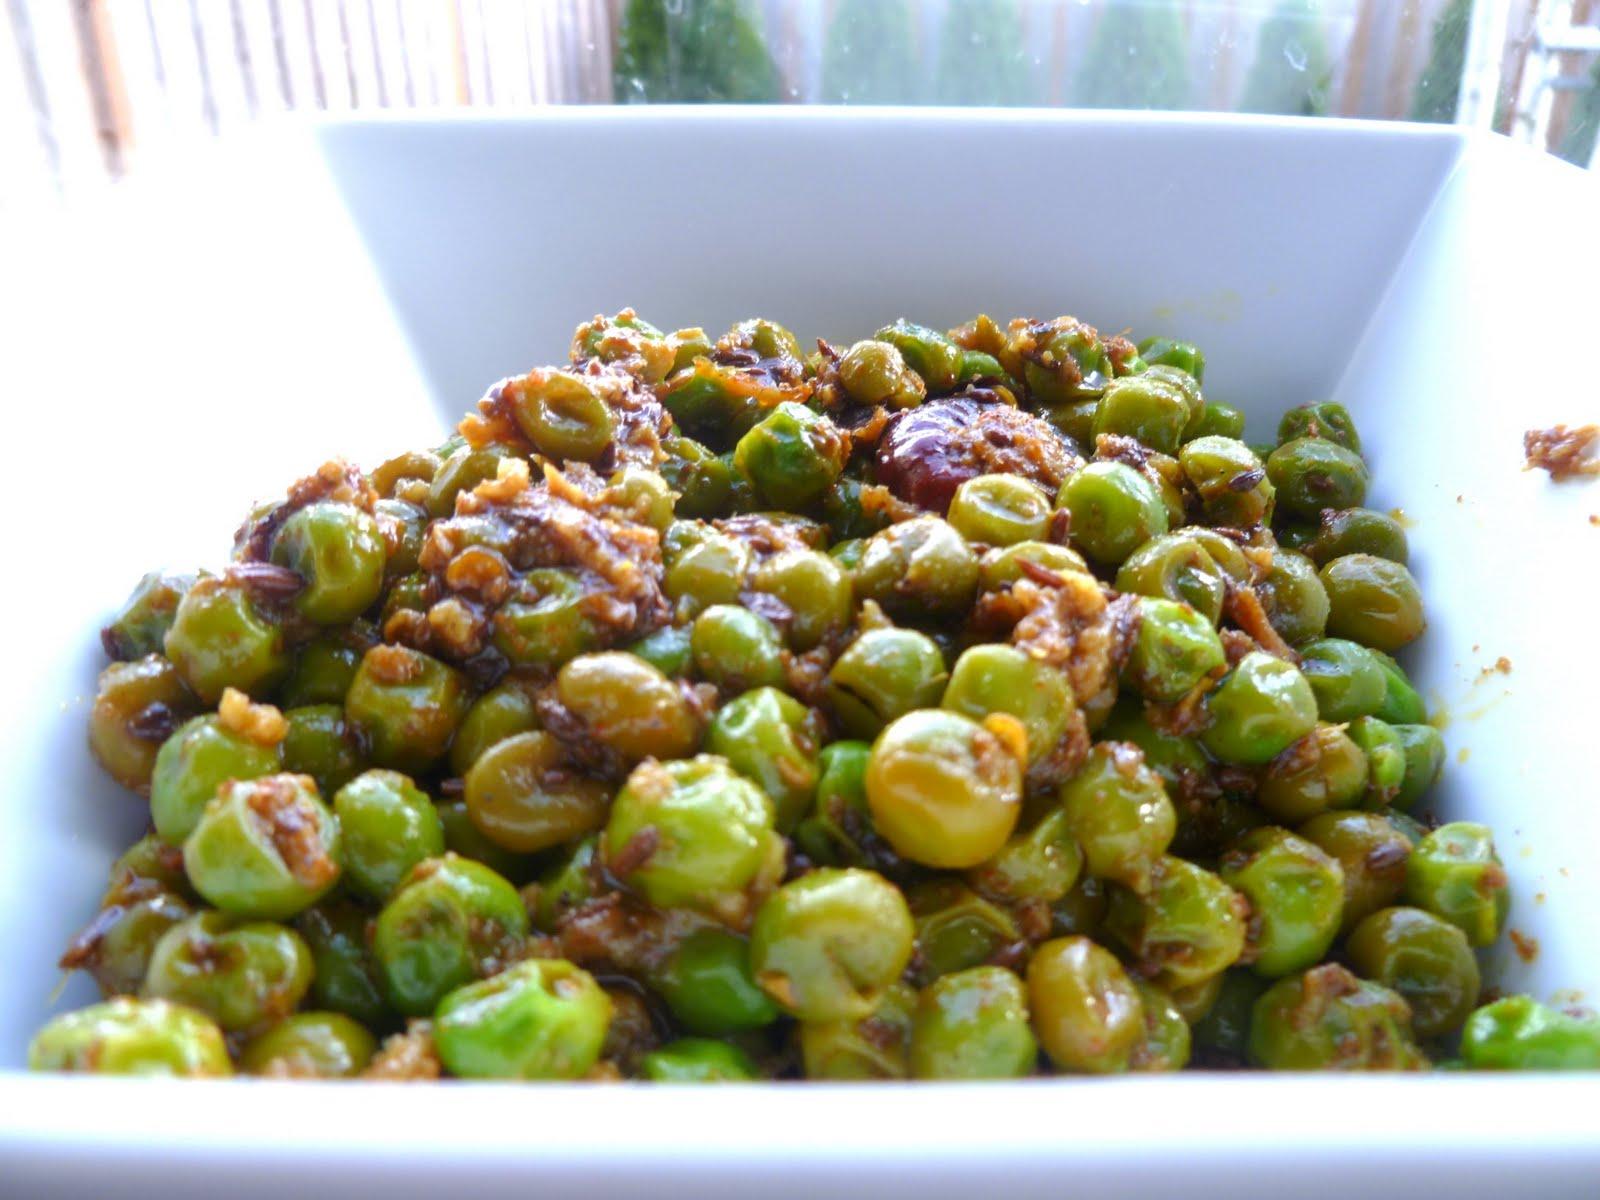 Nisha's Kitchen: Matar ki chaat / Sweat Pea stir fry